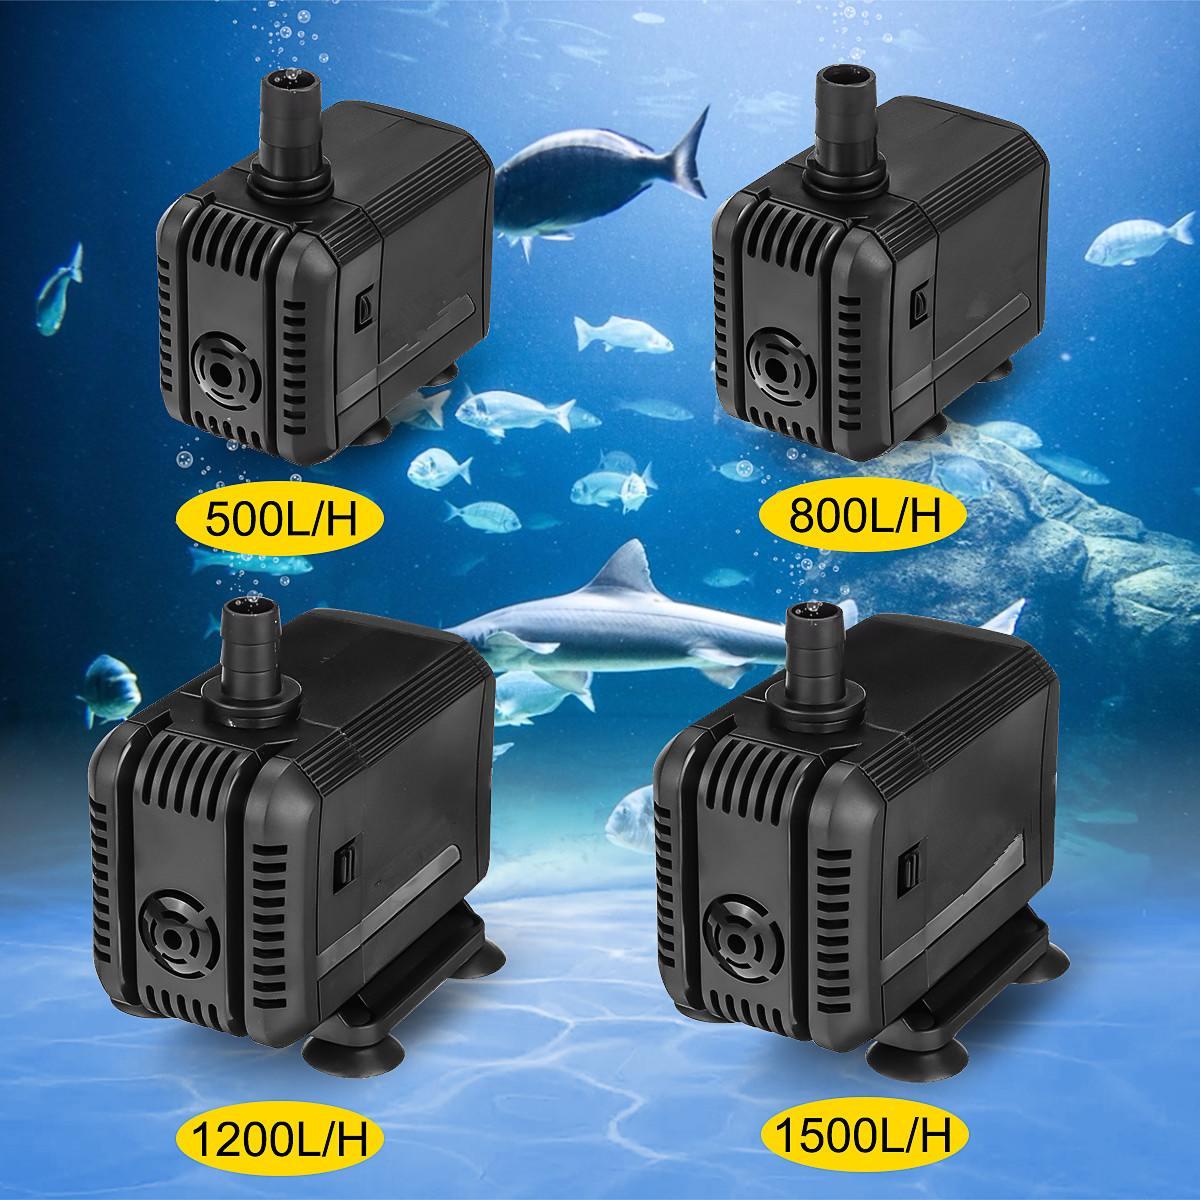 110V Portable Aquarium Water Pump ABS Low Power Mini Pumps Waterproof Submersible Fish Tank Pond Pool Fountains Water Pump